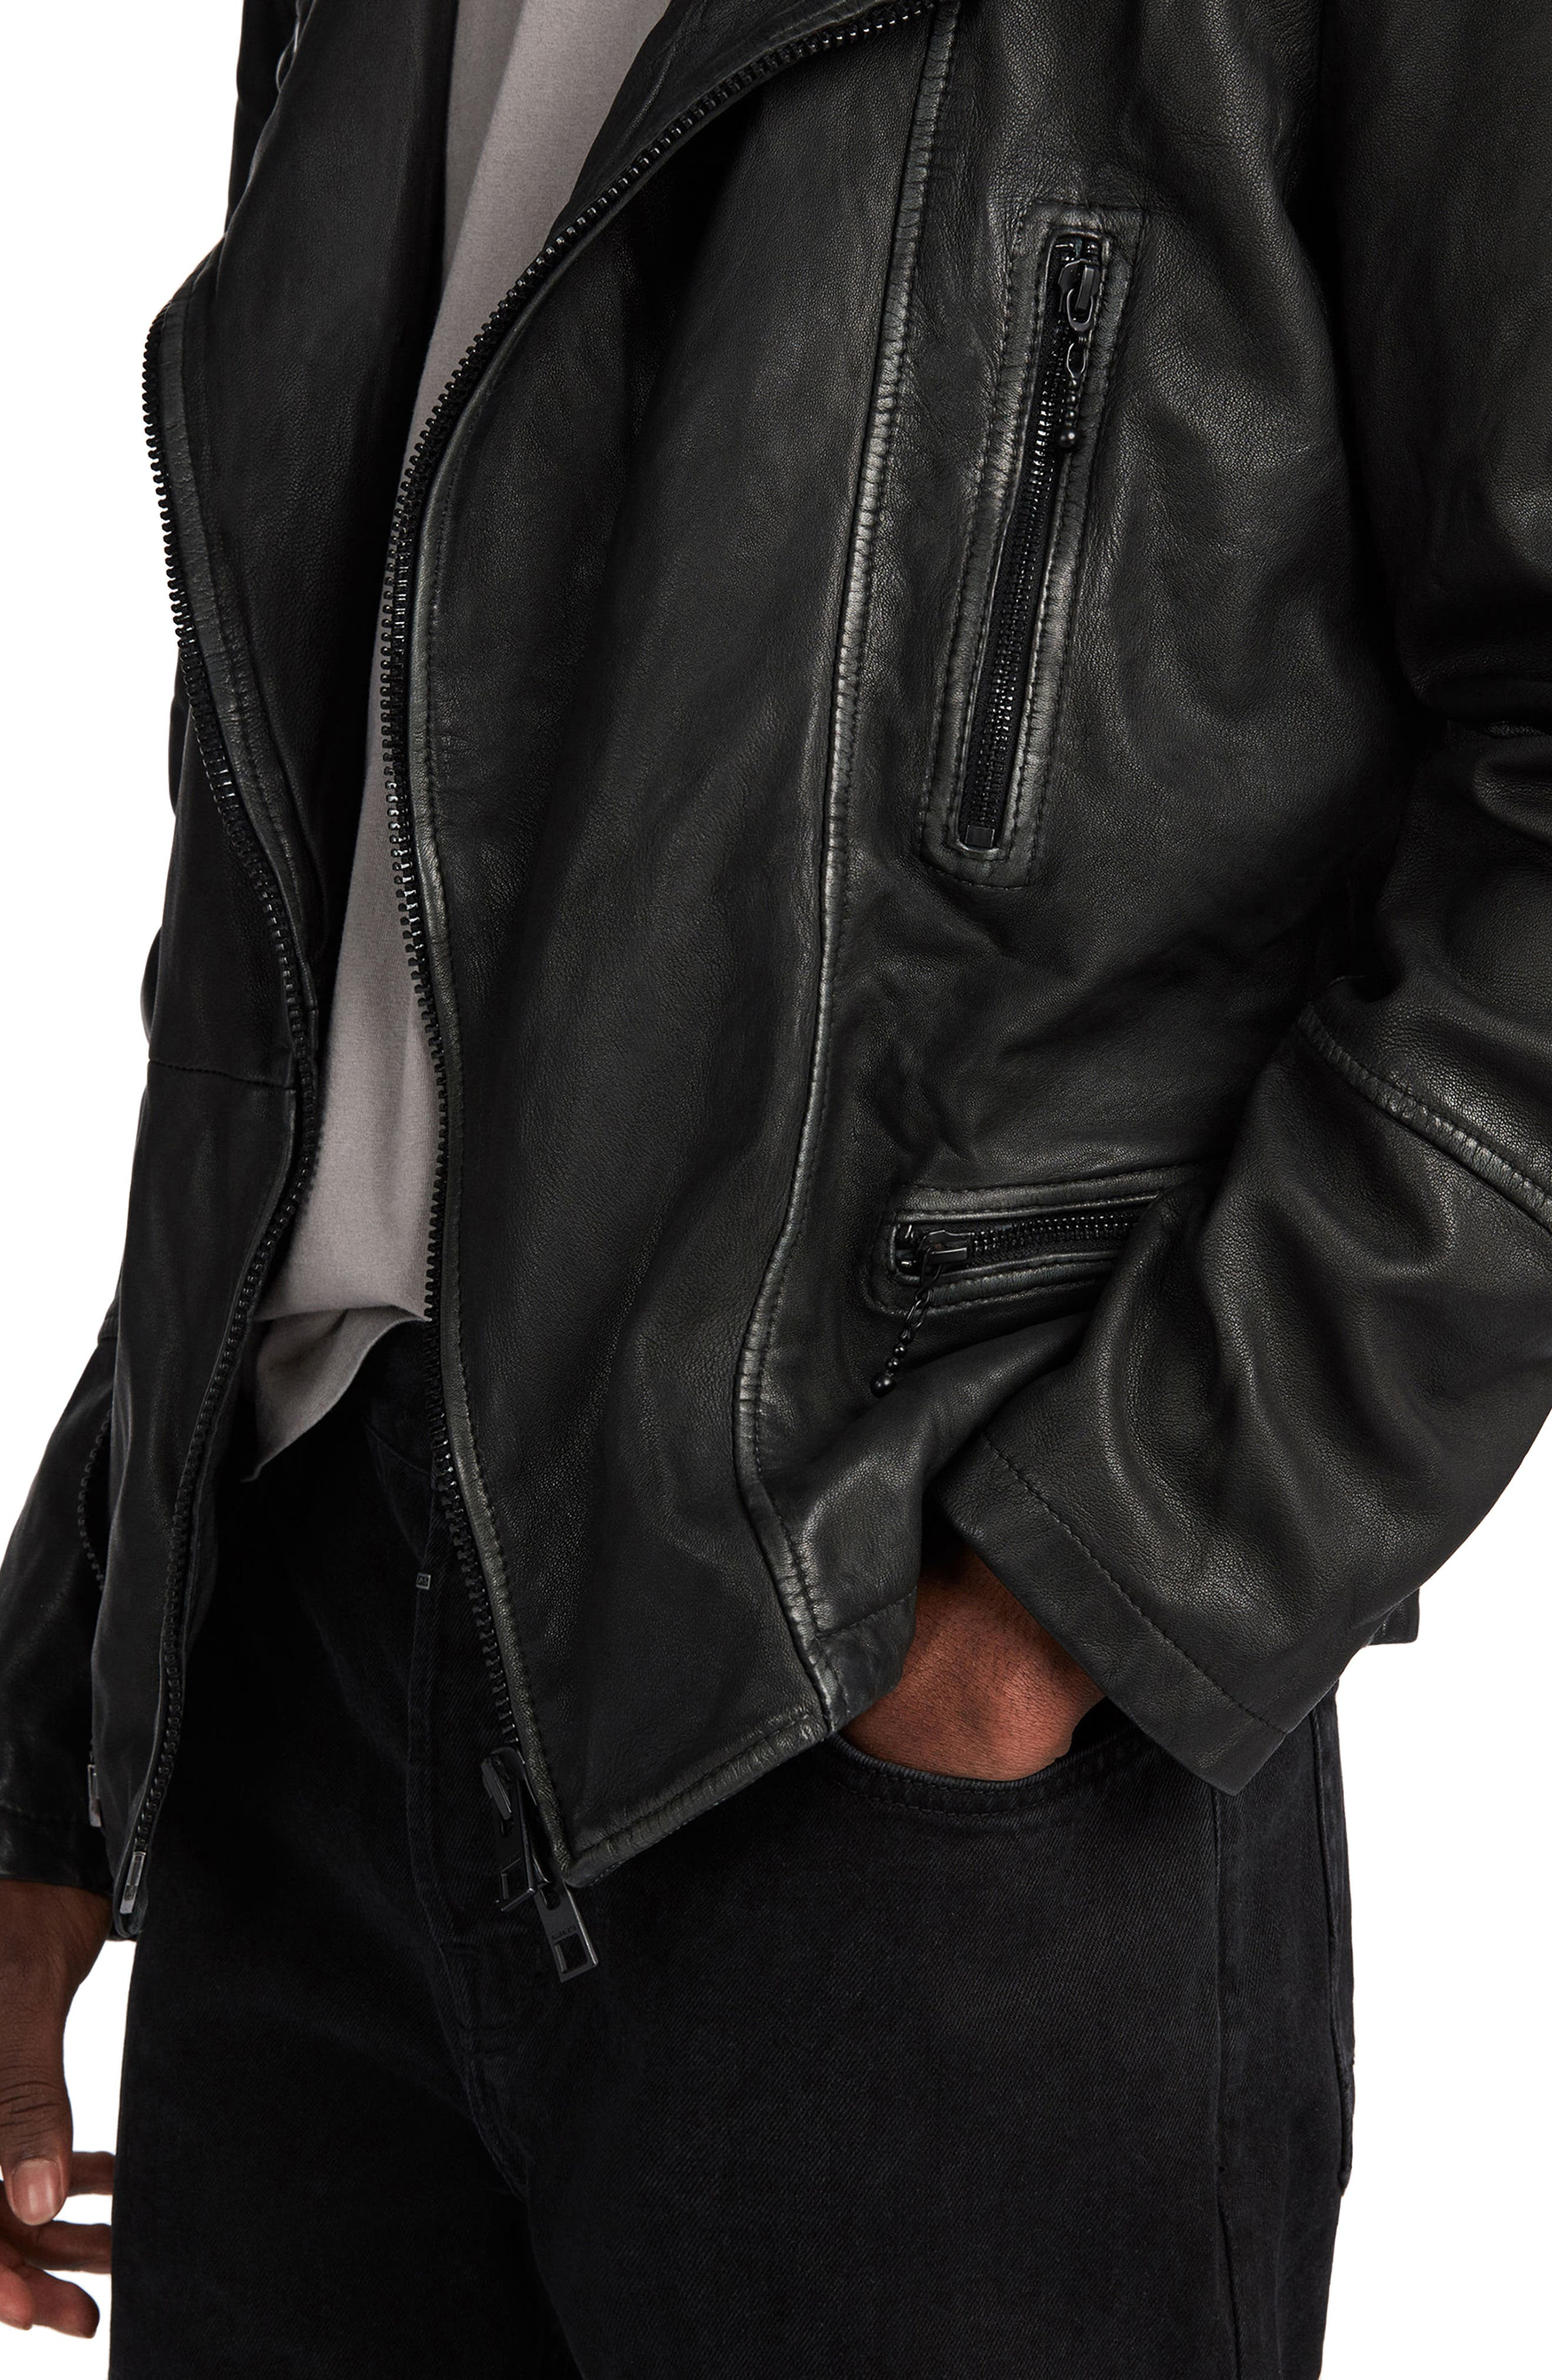 ALLSAINTS, Cargo Biker Slim Fit Leather Jacket, Alternate thumbnail 6, color, BLACK GREY